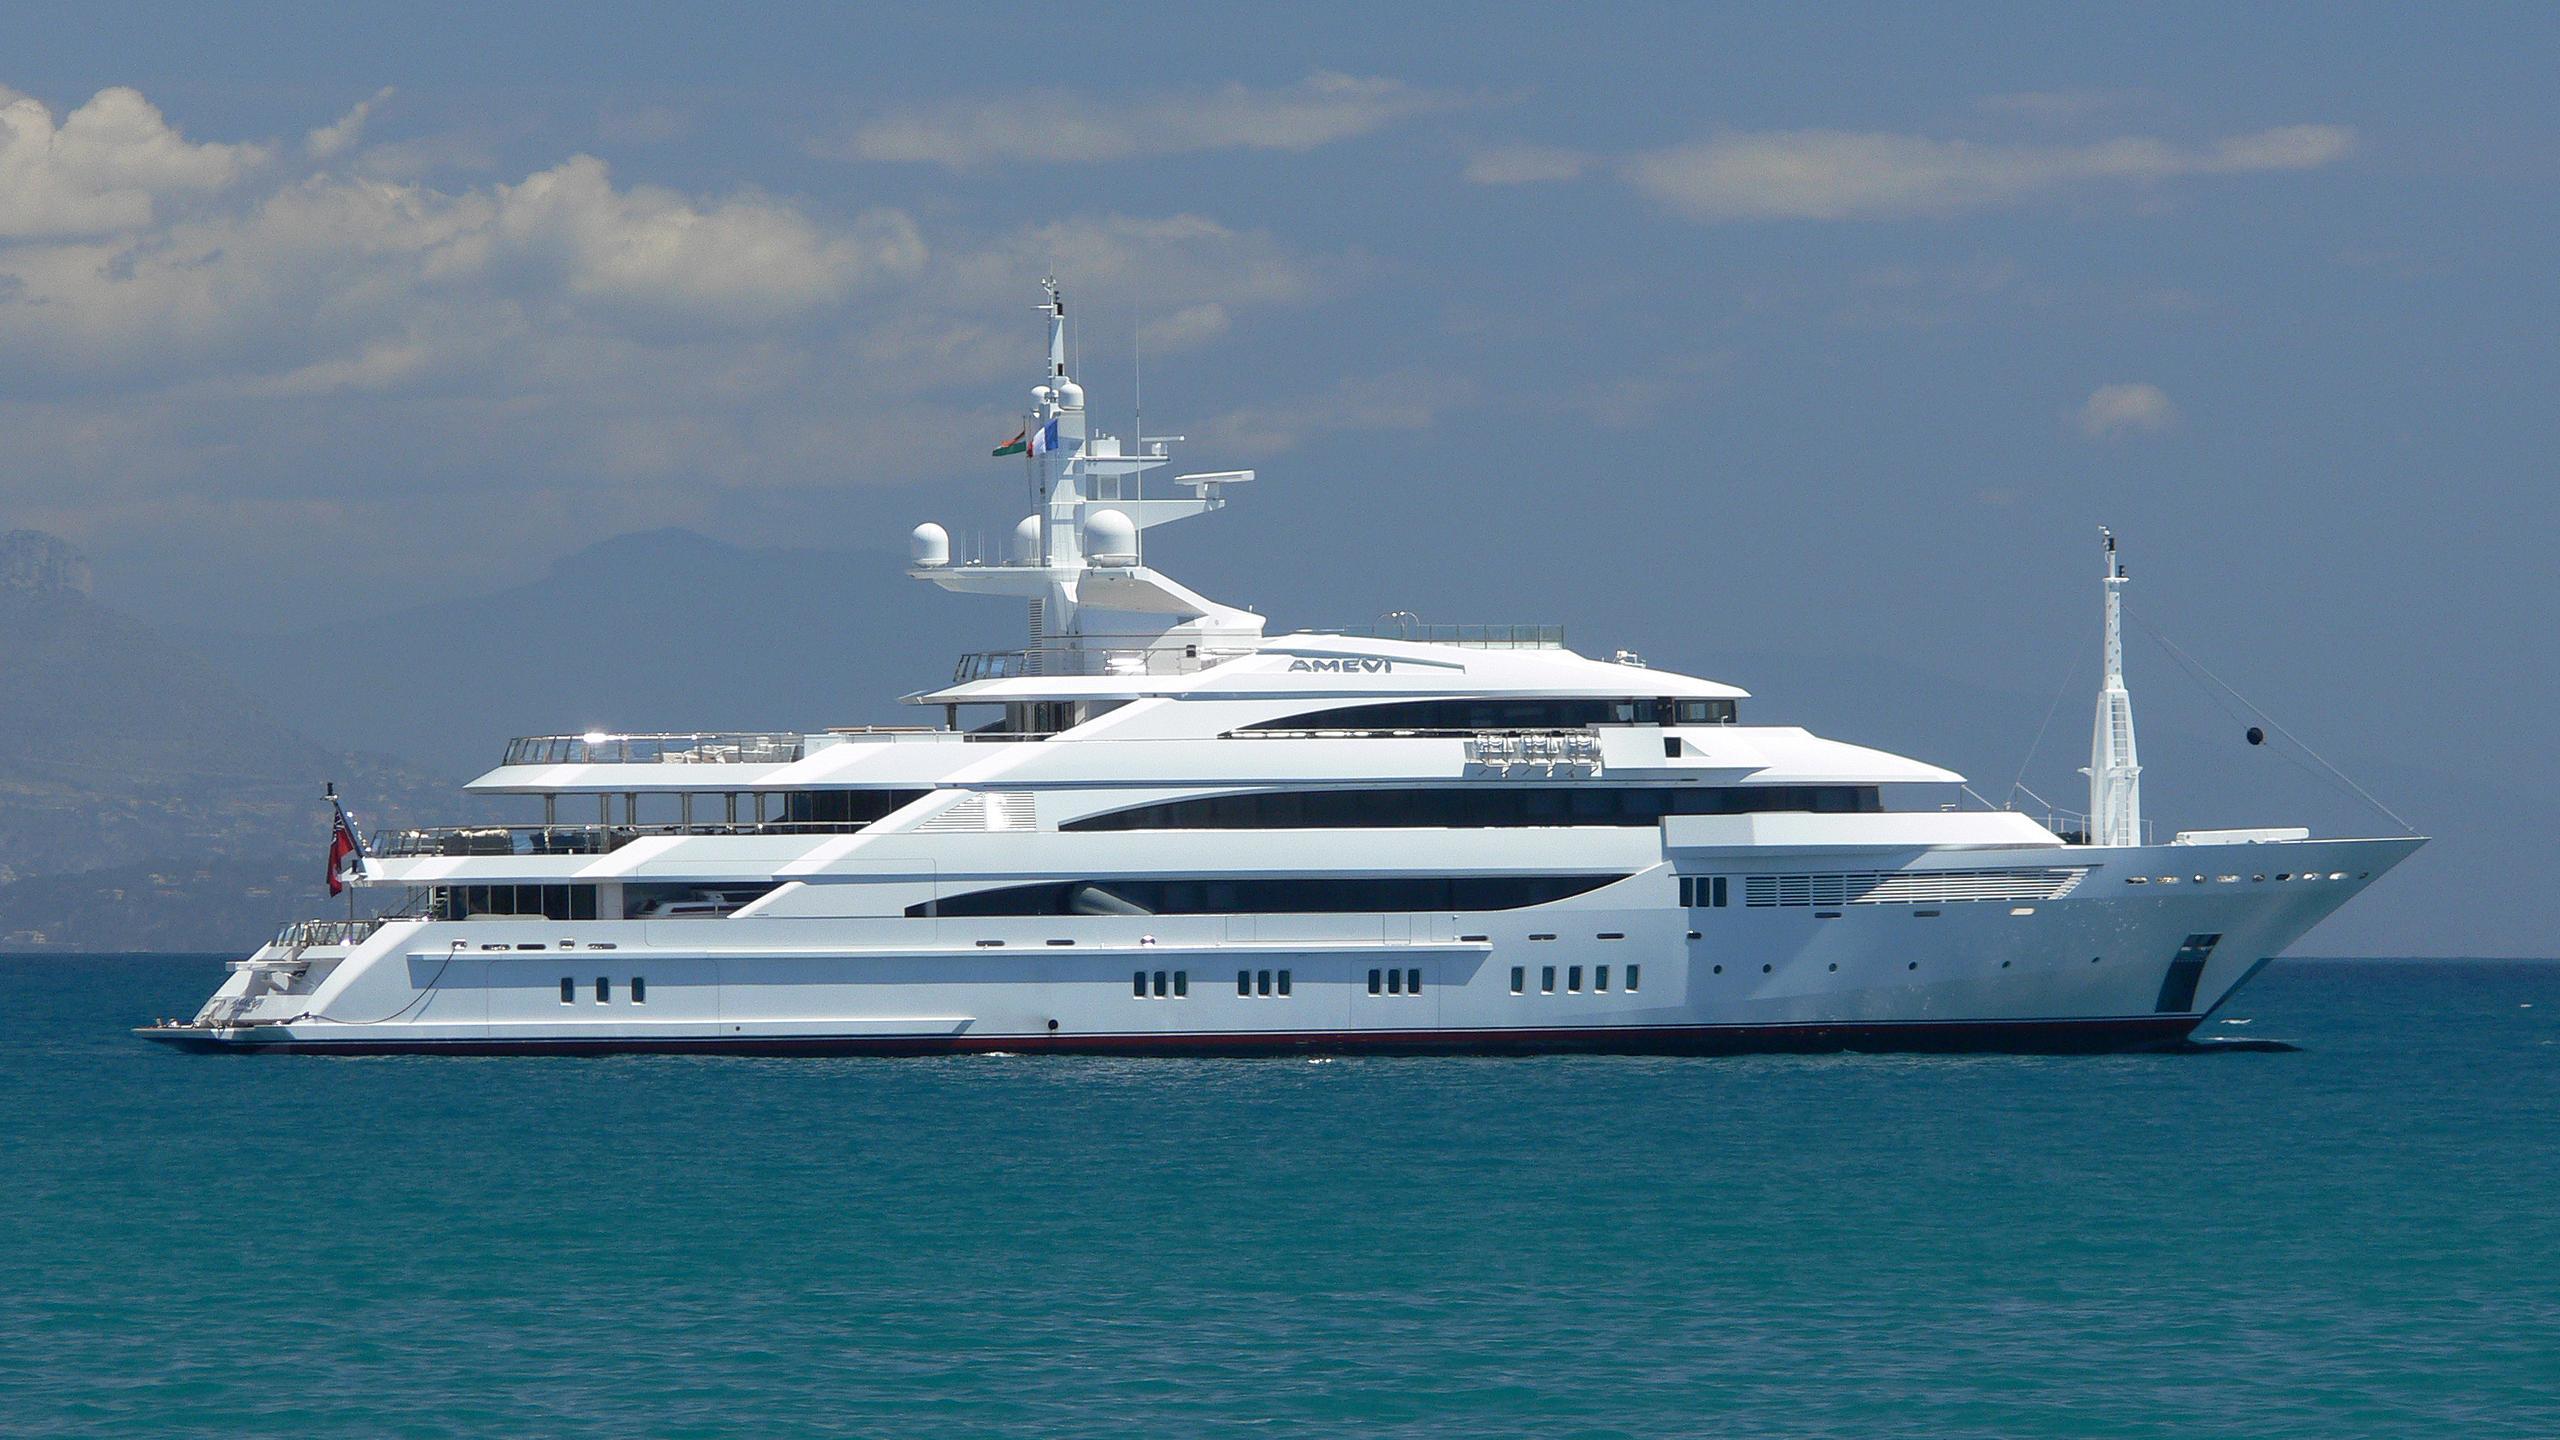 amevi-motoryacht-oceanco-2007-80m-profile-before-refit